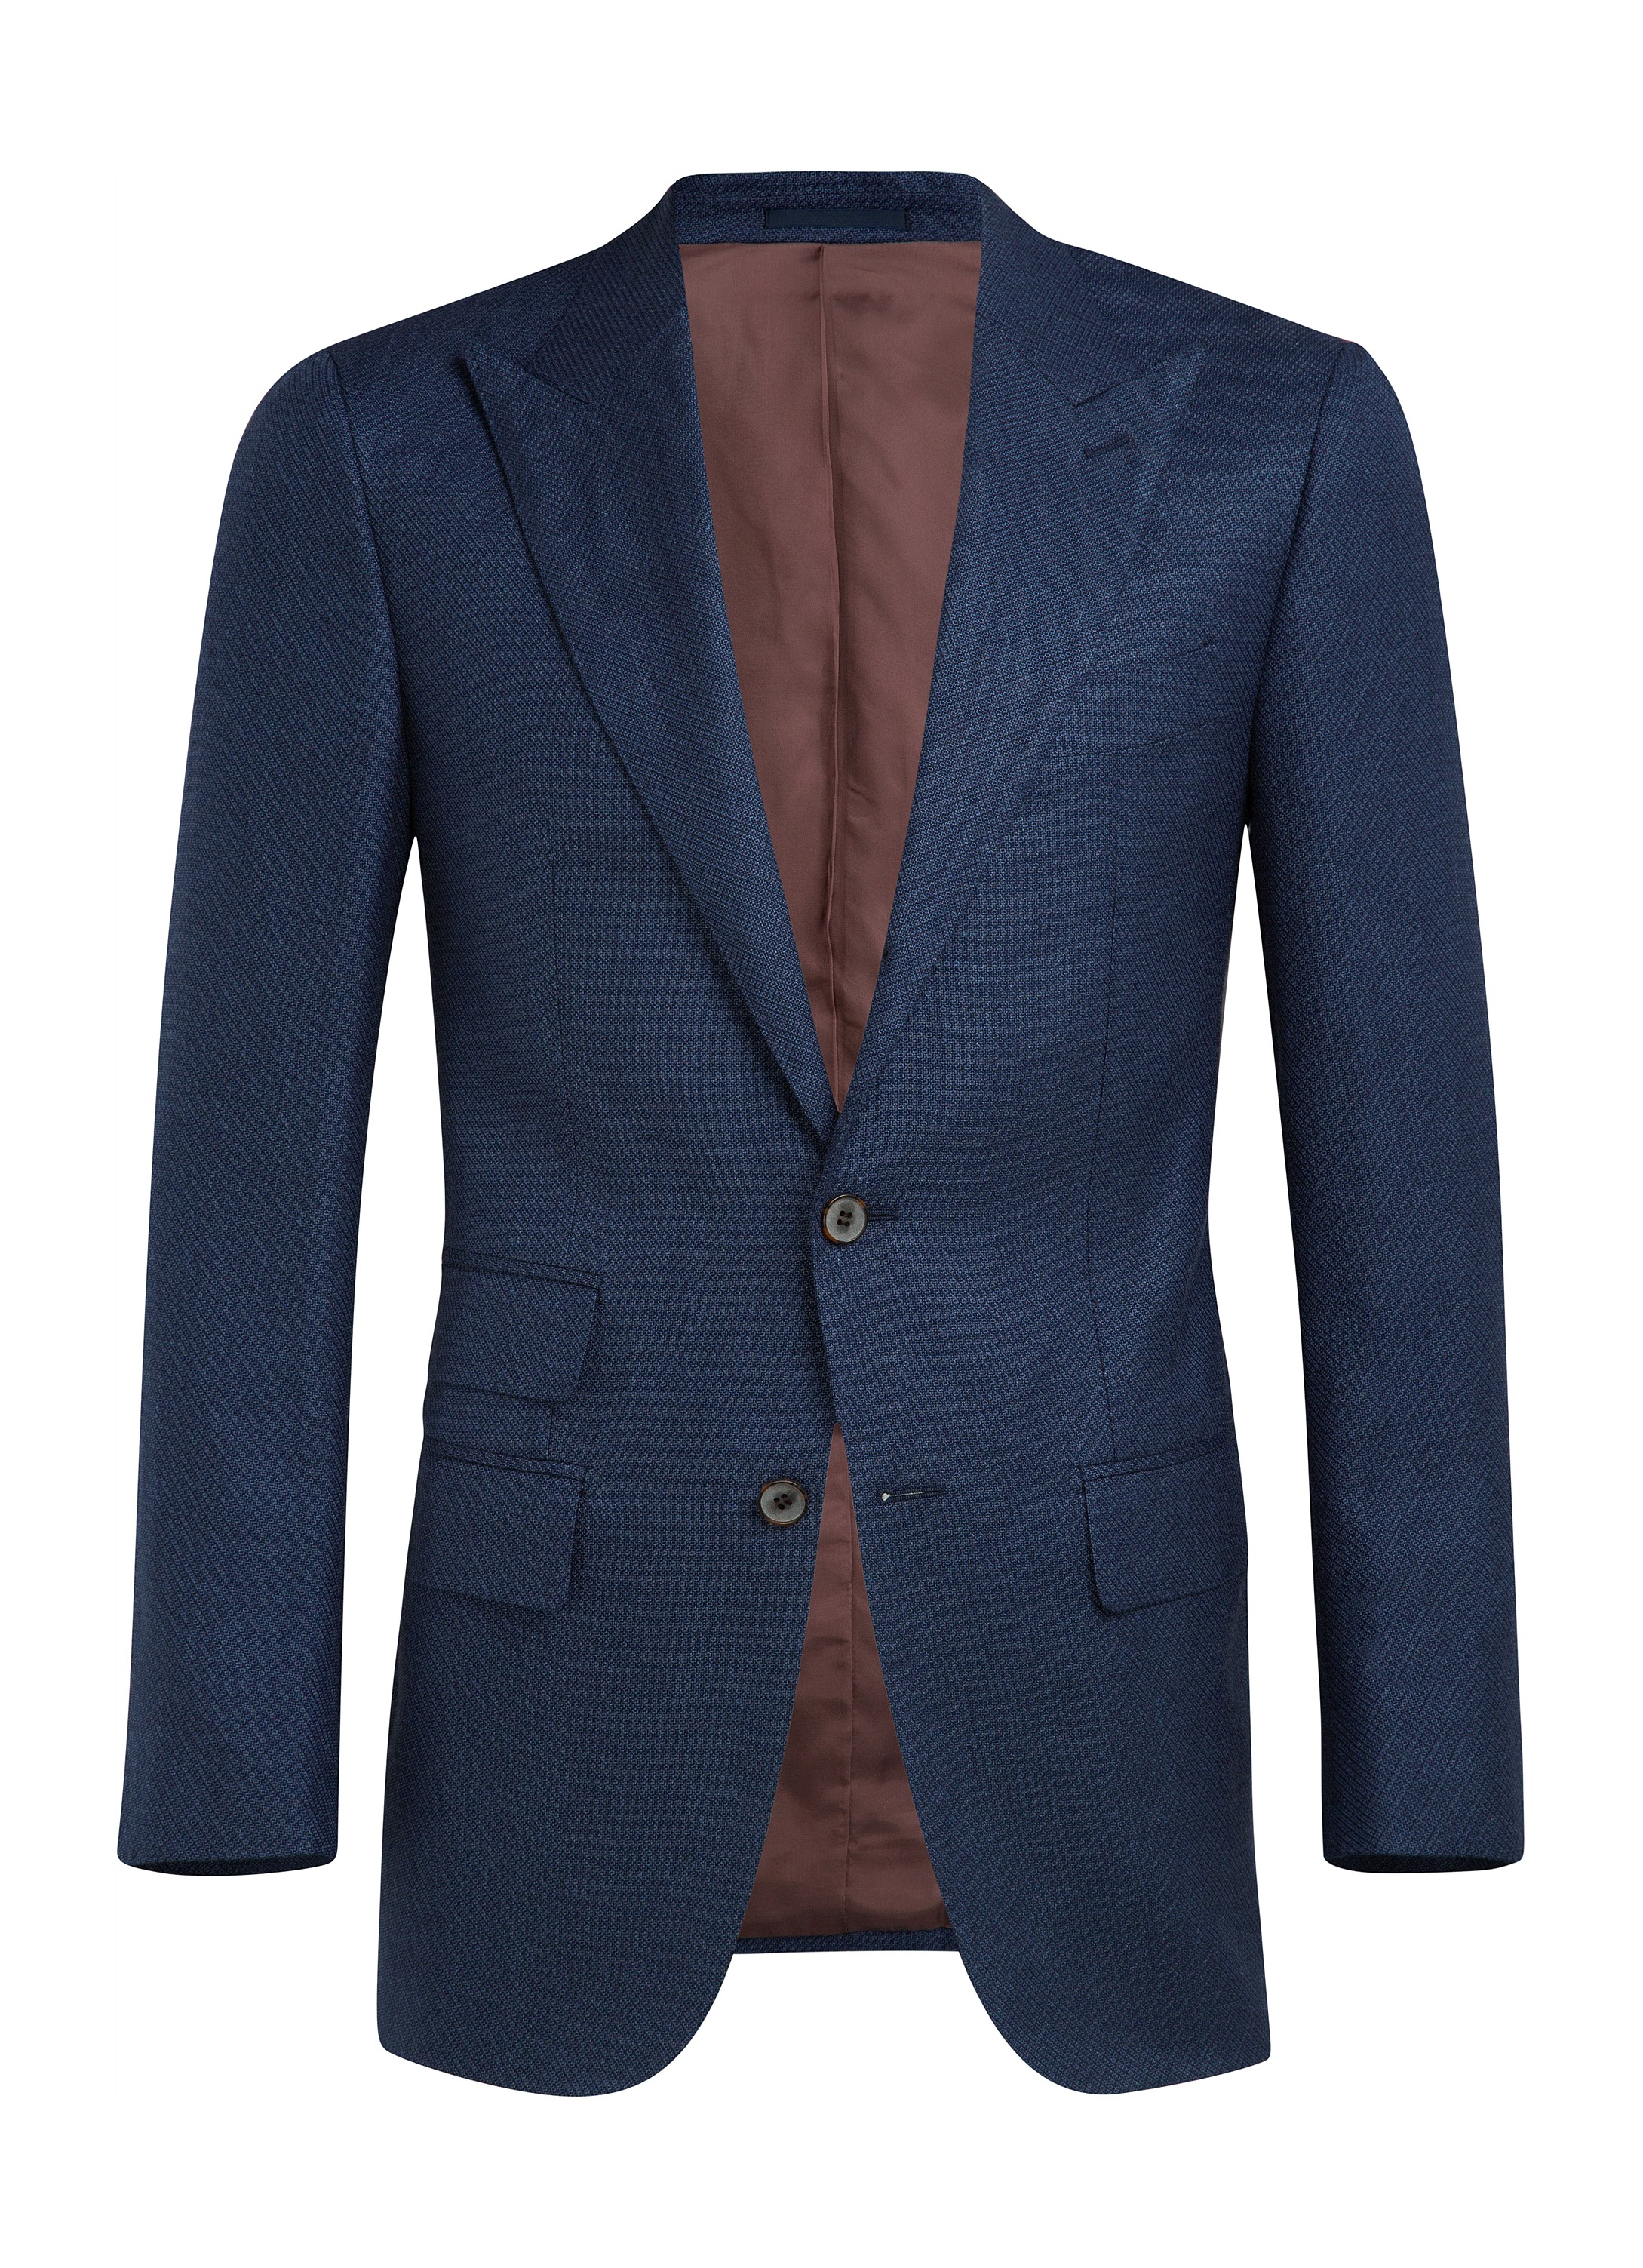 http://statics.suitsupply.com/images/products/Jackets/zoom/Jackets_Blue_Plain_Washington_C743_Suitsupply_Online_Store_5.jpg